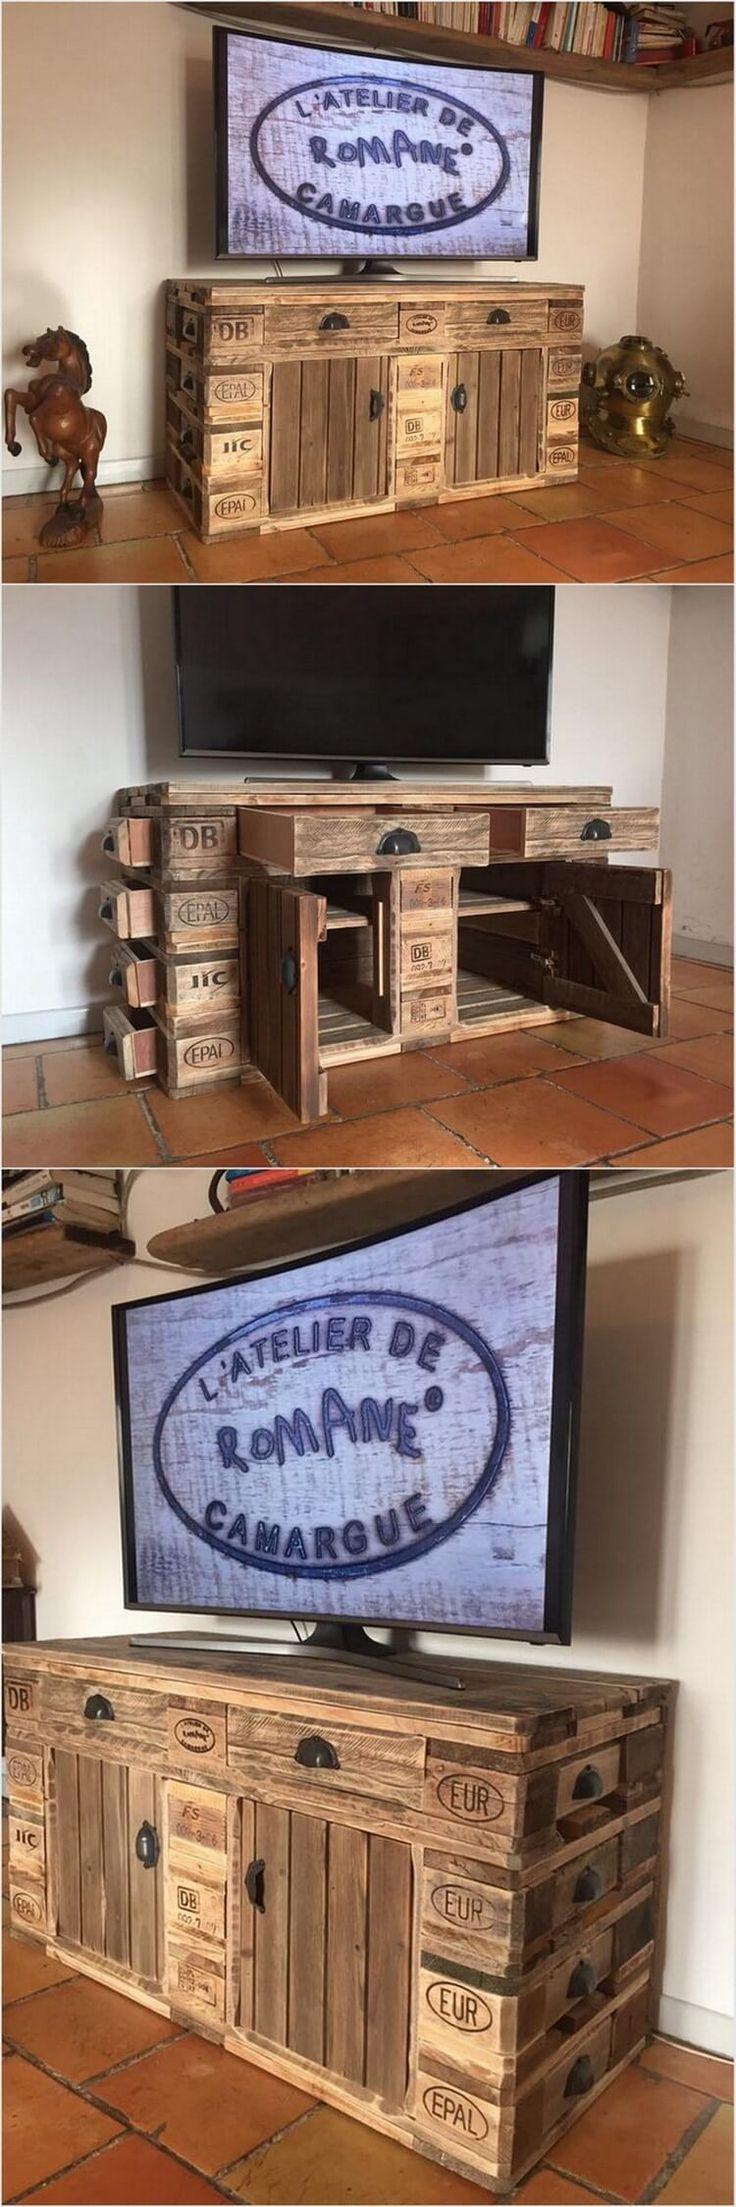 1401 mejores imágenes sobre House and furniture ideas en Pinterest ...